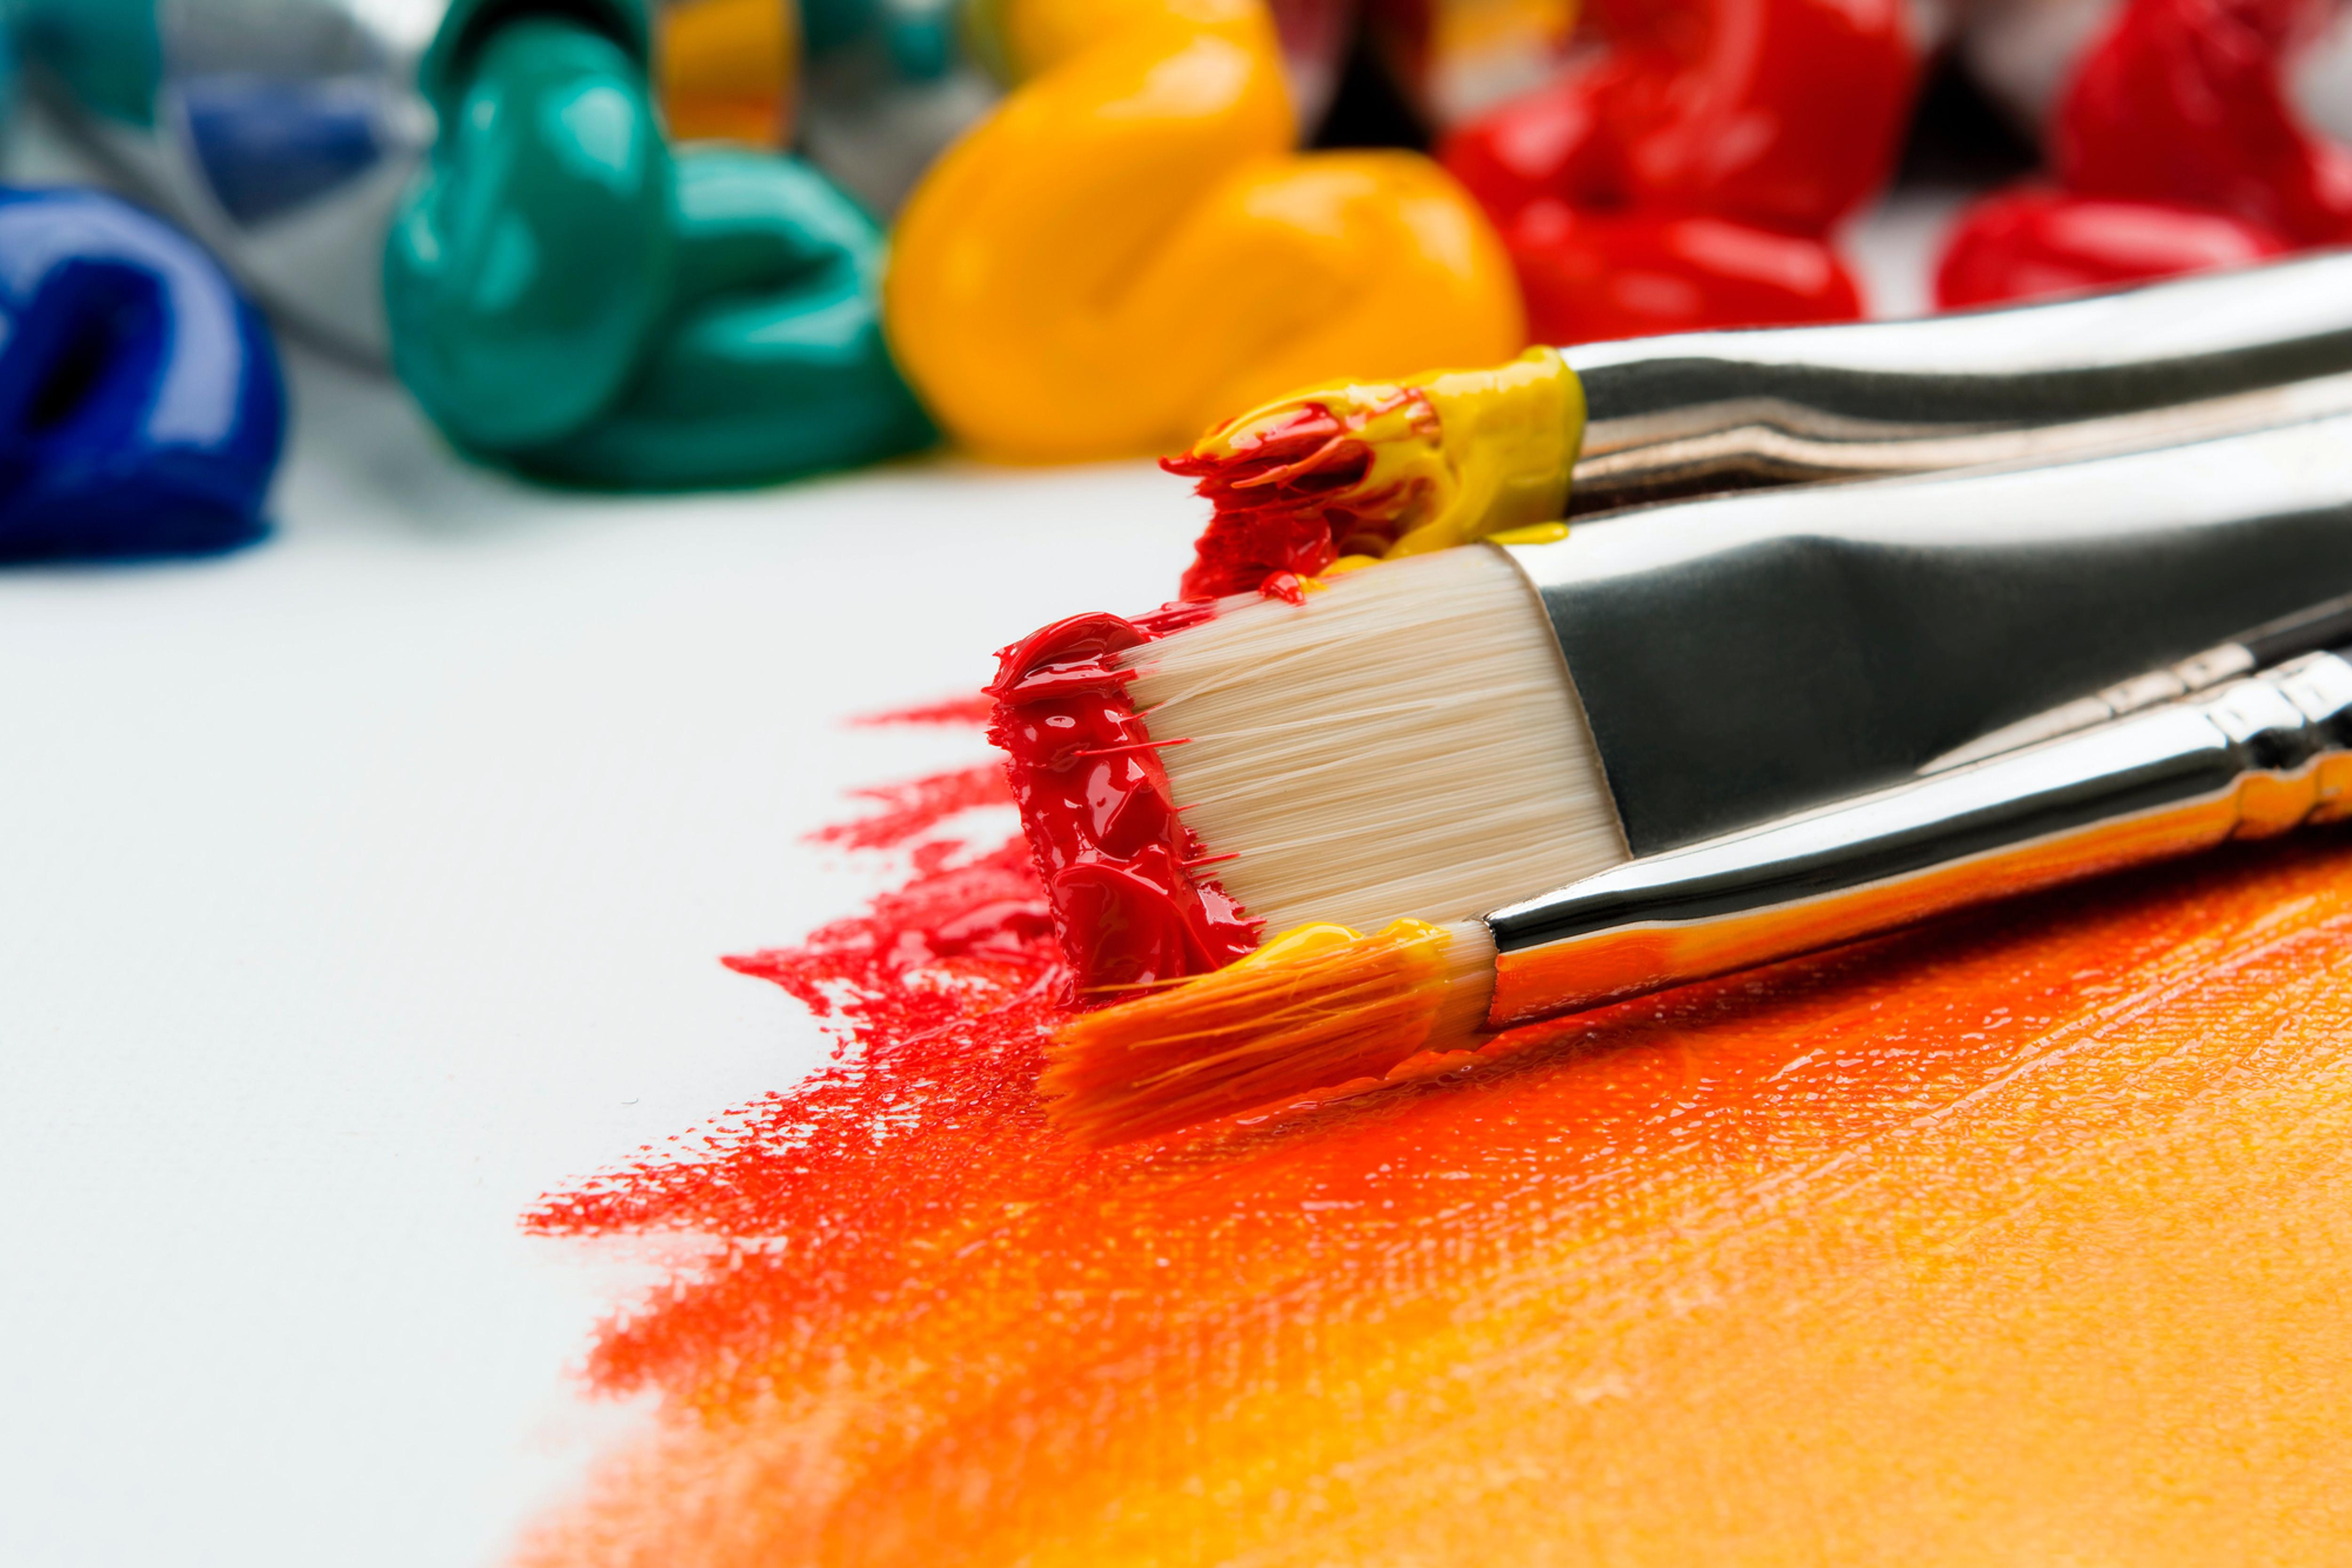 Sunday - Acrylic-Oil Painting Studio